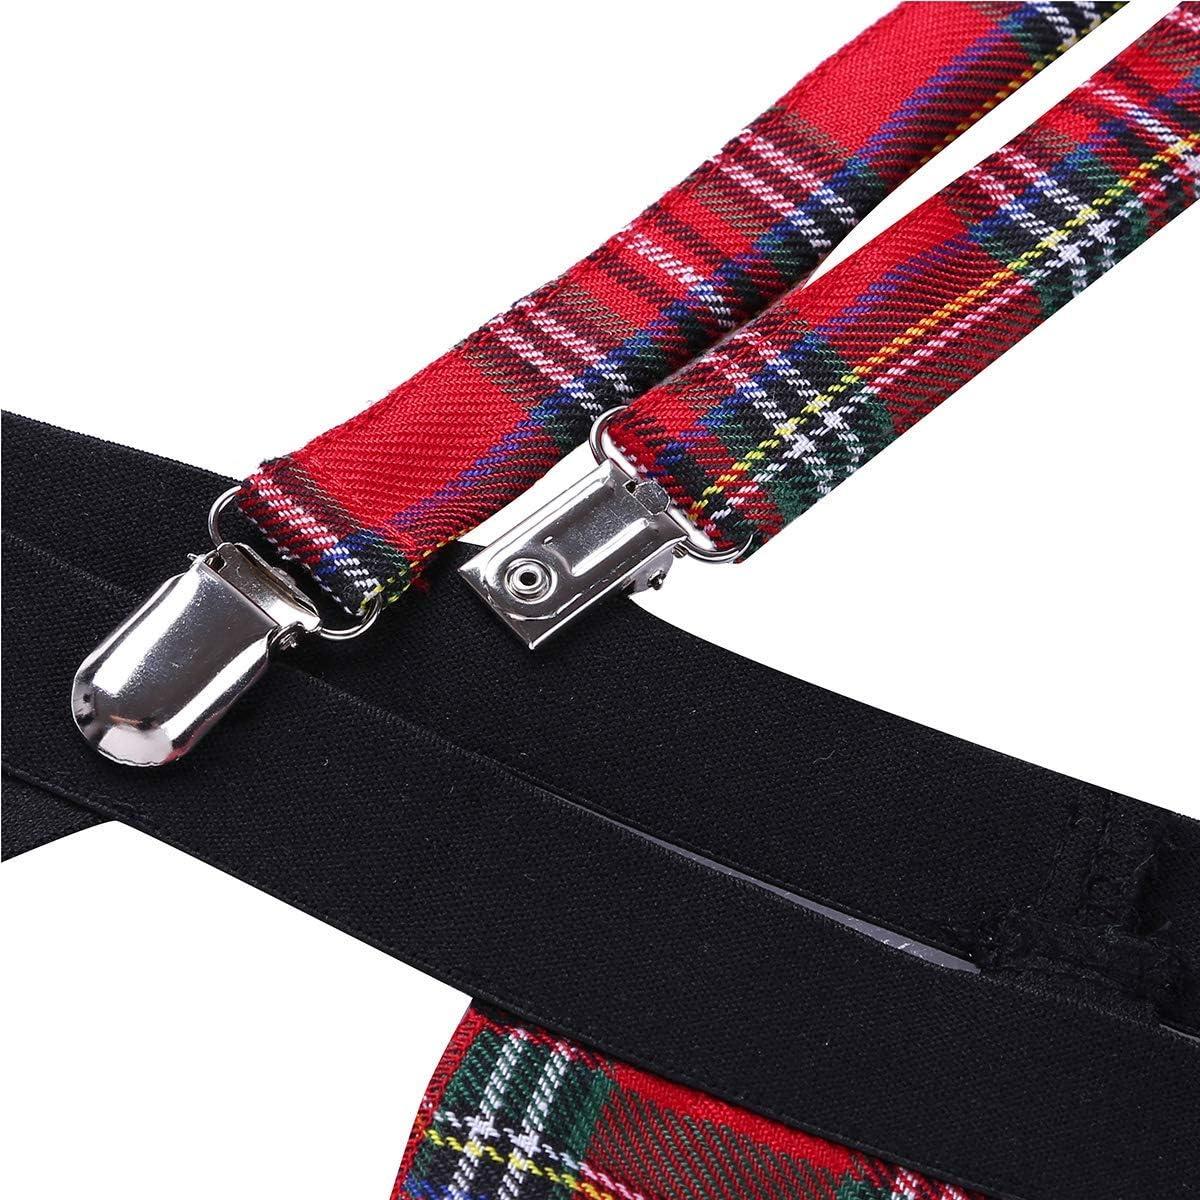 YiZYiF Mens Jock Strap Sissy Pouch G String Red Plaid Skirt Underwear Bodysuit with Suspender